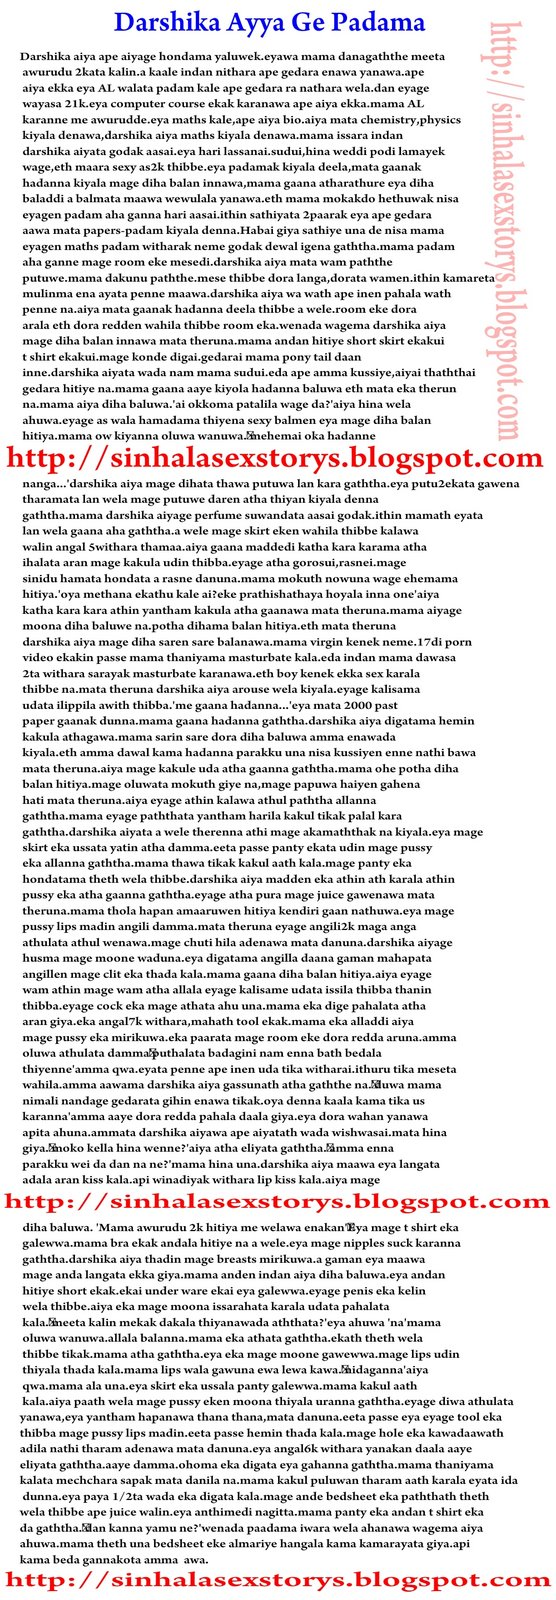 Sinhala wala story box darshika aiyage padama